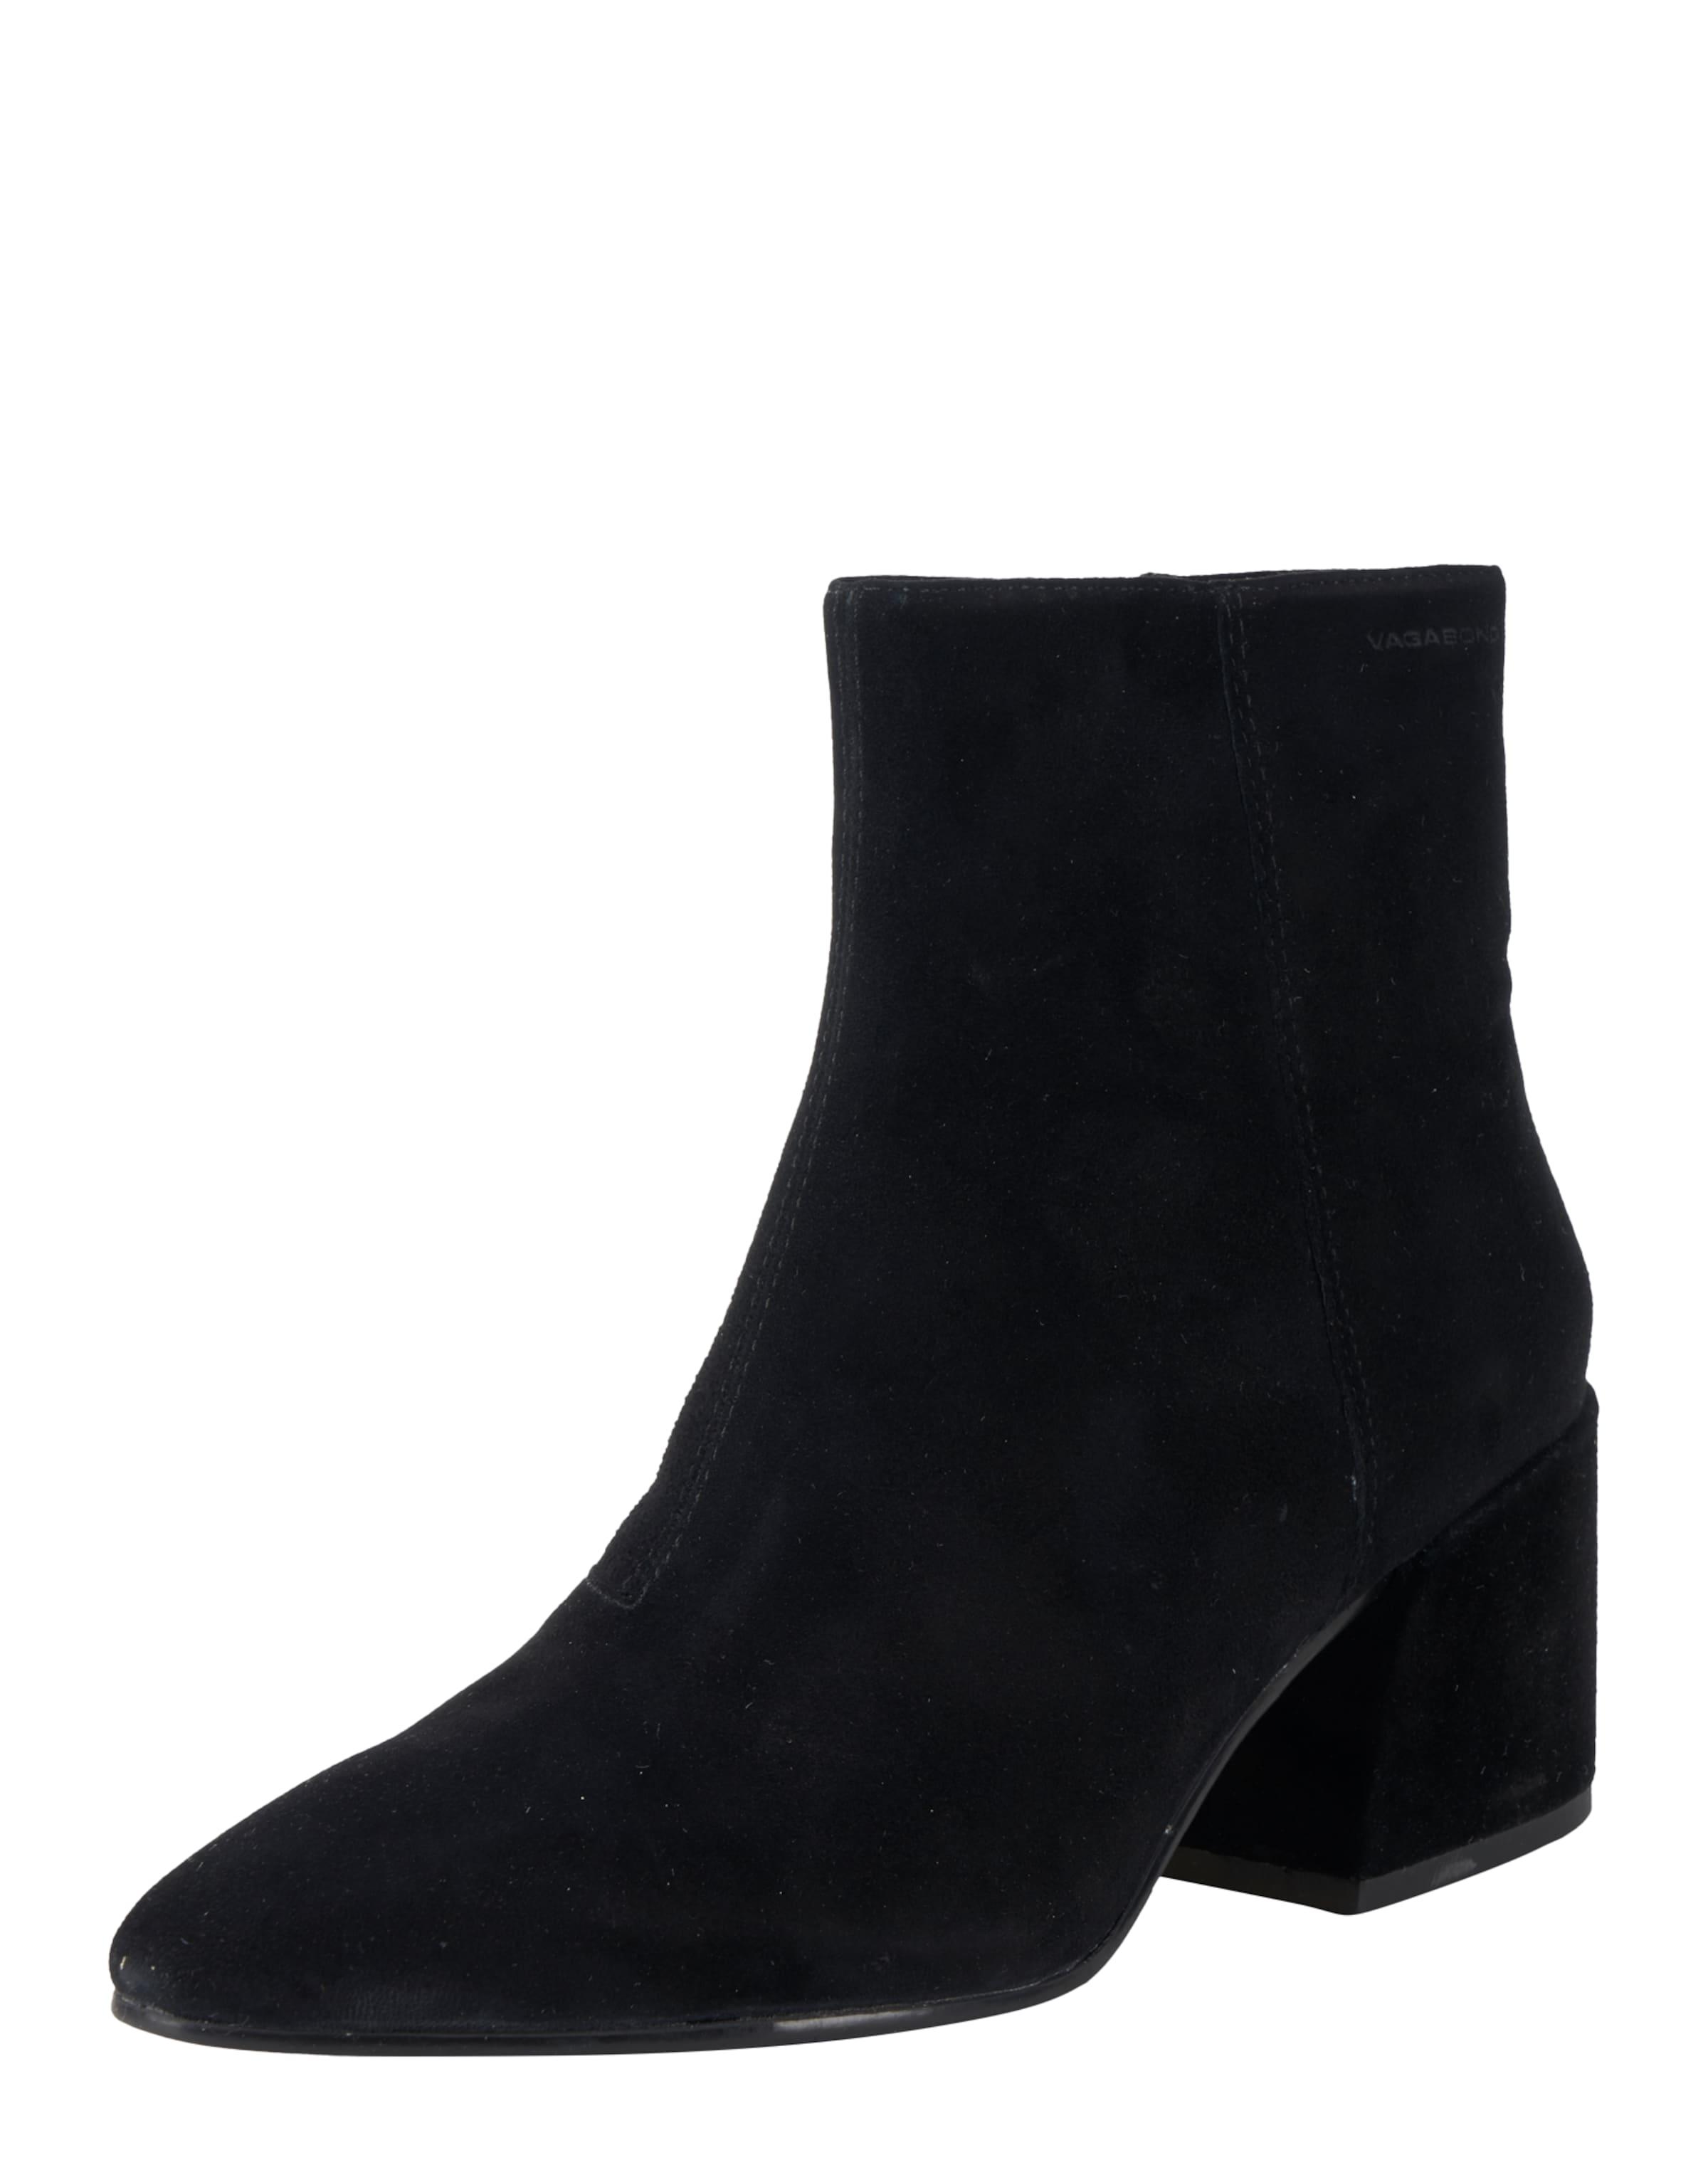 VAGABOND SHOEMAKERS Ankle Boot Olivia Hohe Qualität Qualität Hohe 1e414d